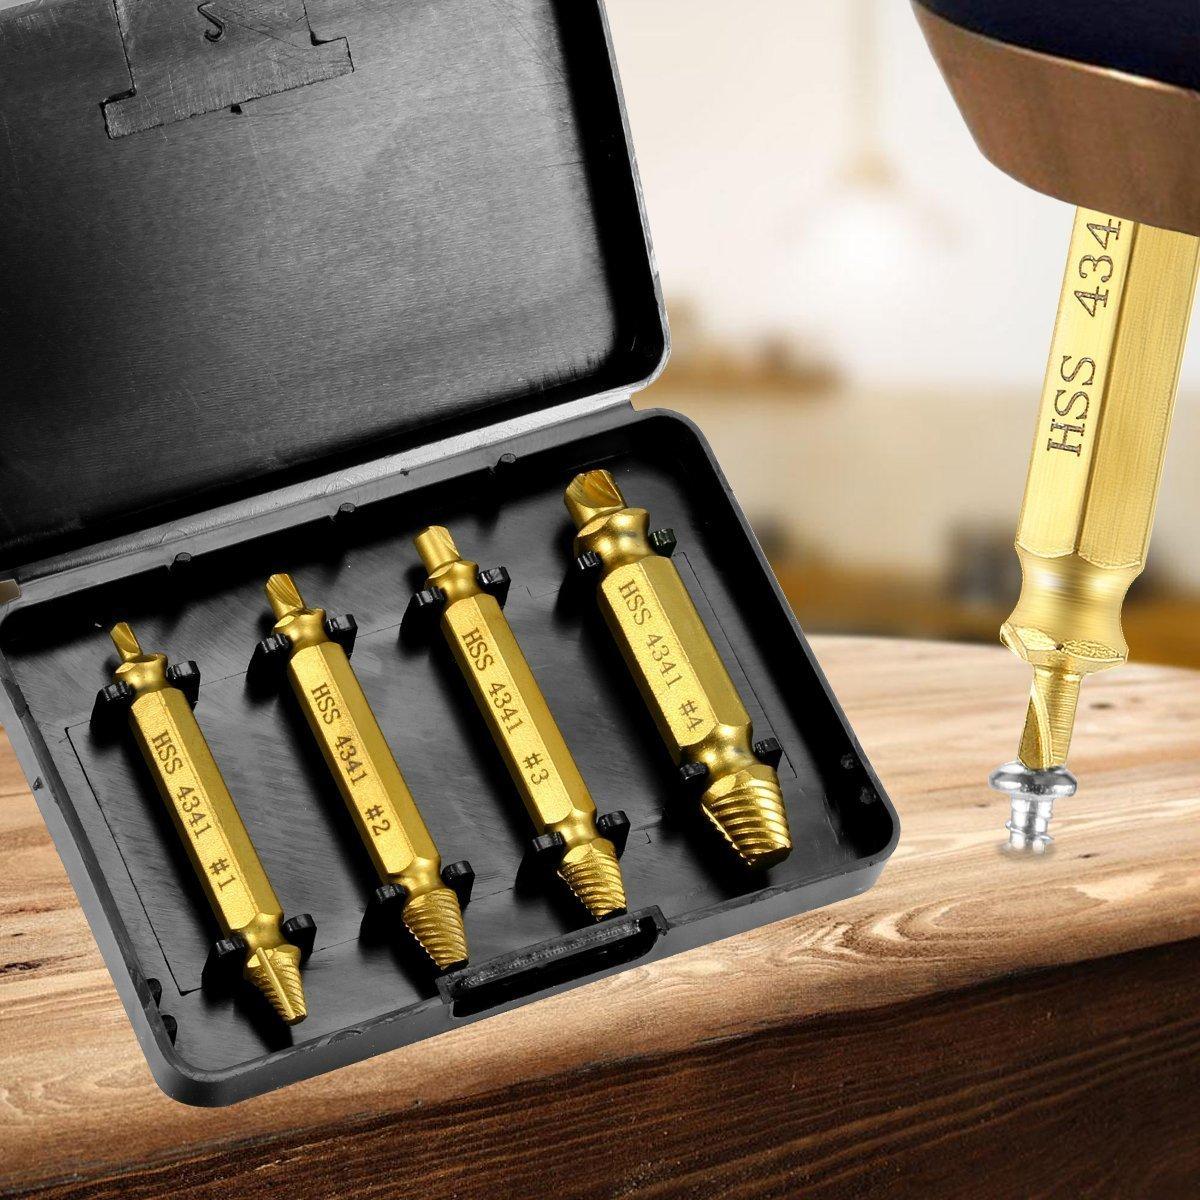 Demason 6 Pcs HSS 4341 Screw Extractor Set Damaged Screw Remover and Bolt Extractor #0#1#2#2#3#4 Professional Broken Screw Extractor Tool